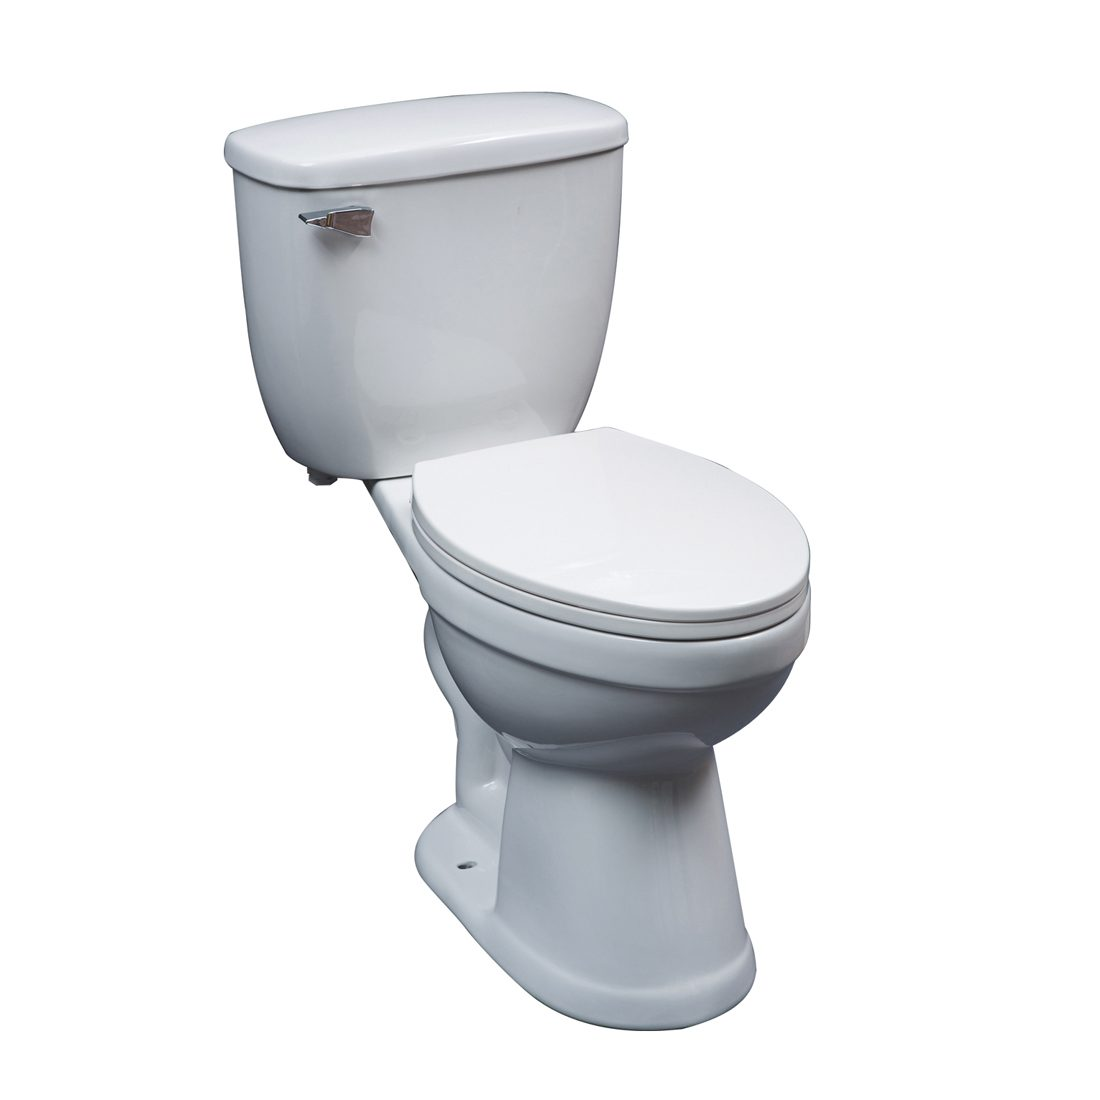 Denver Toilet 18inch 6L White Front View